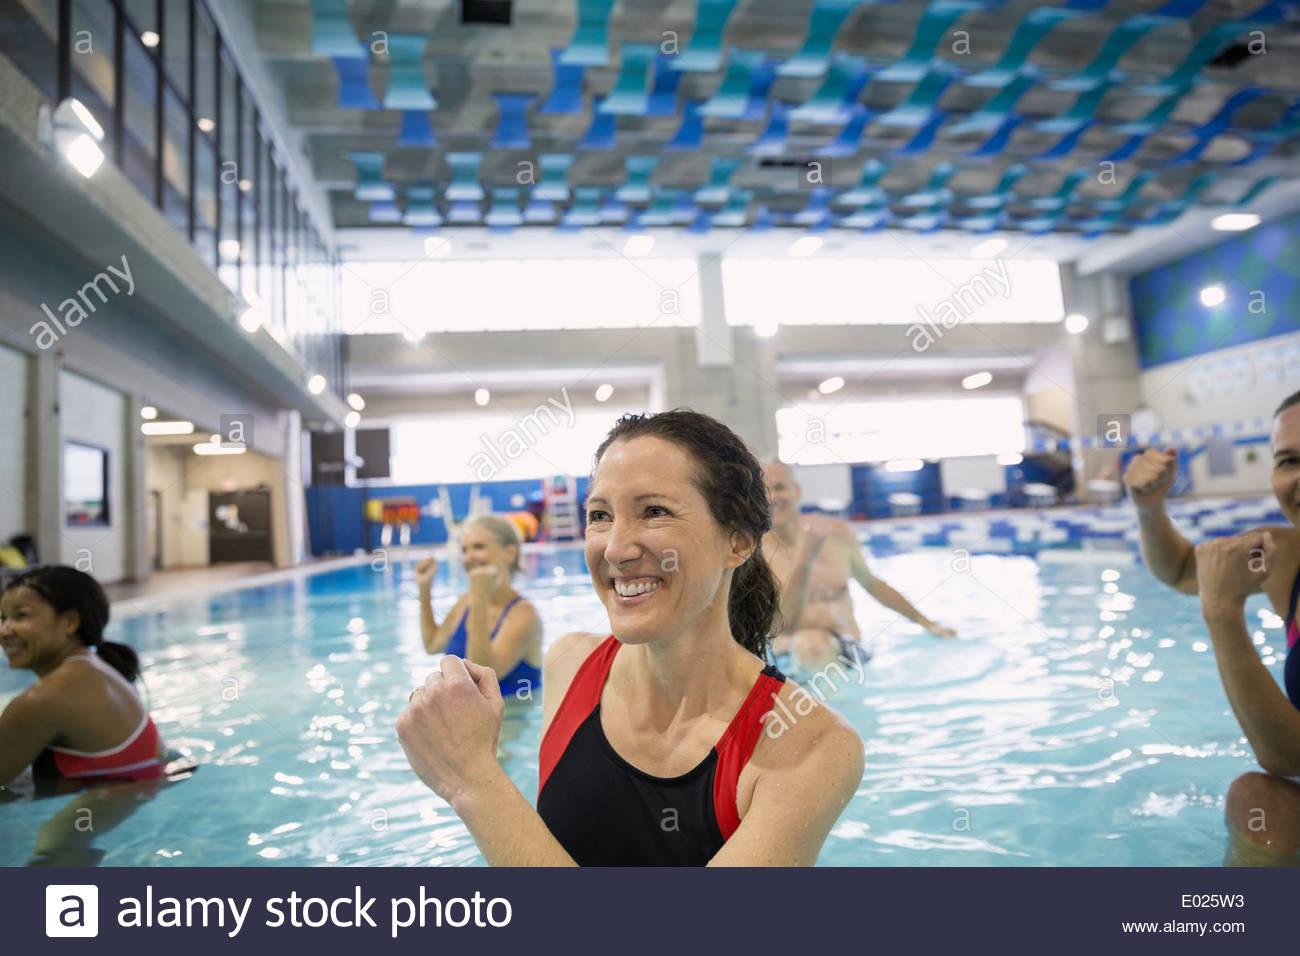 Water aerobics class at indoor swimming pool - Stock Image